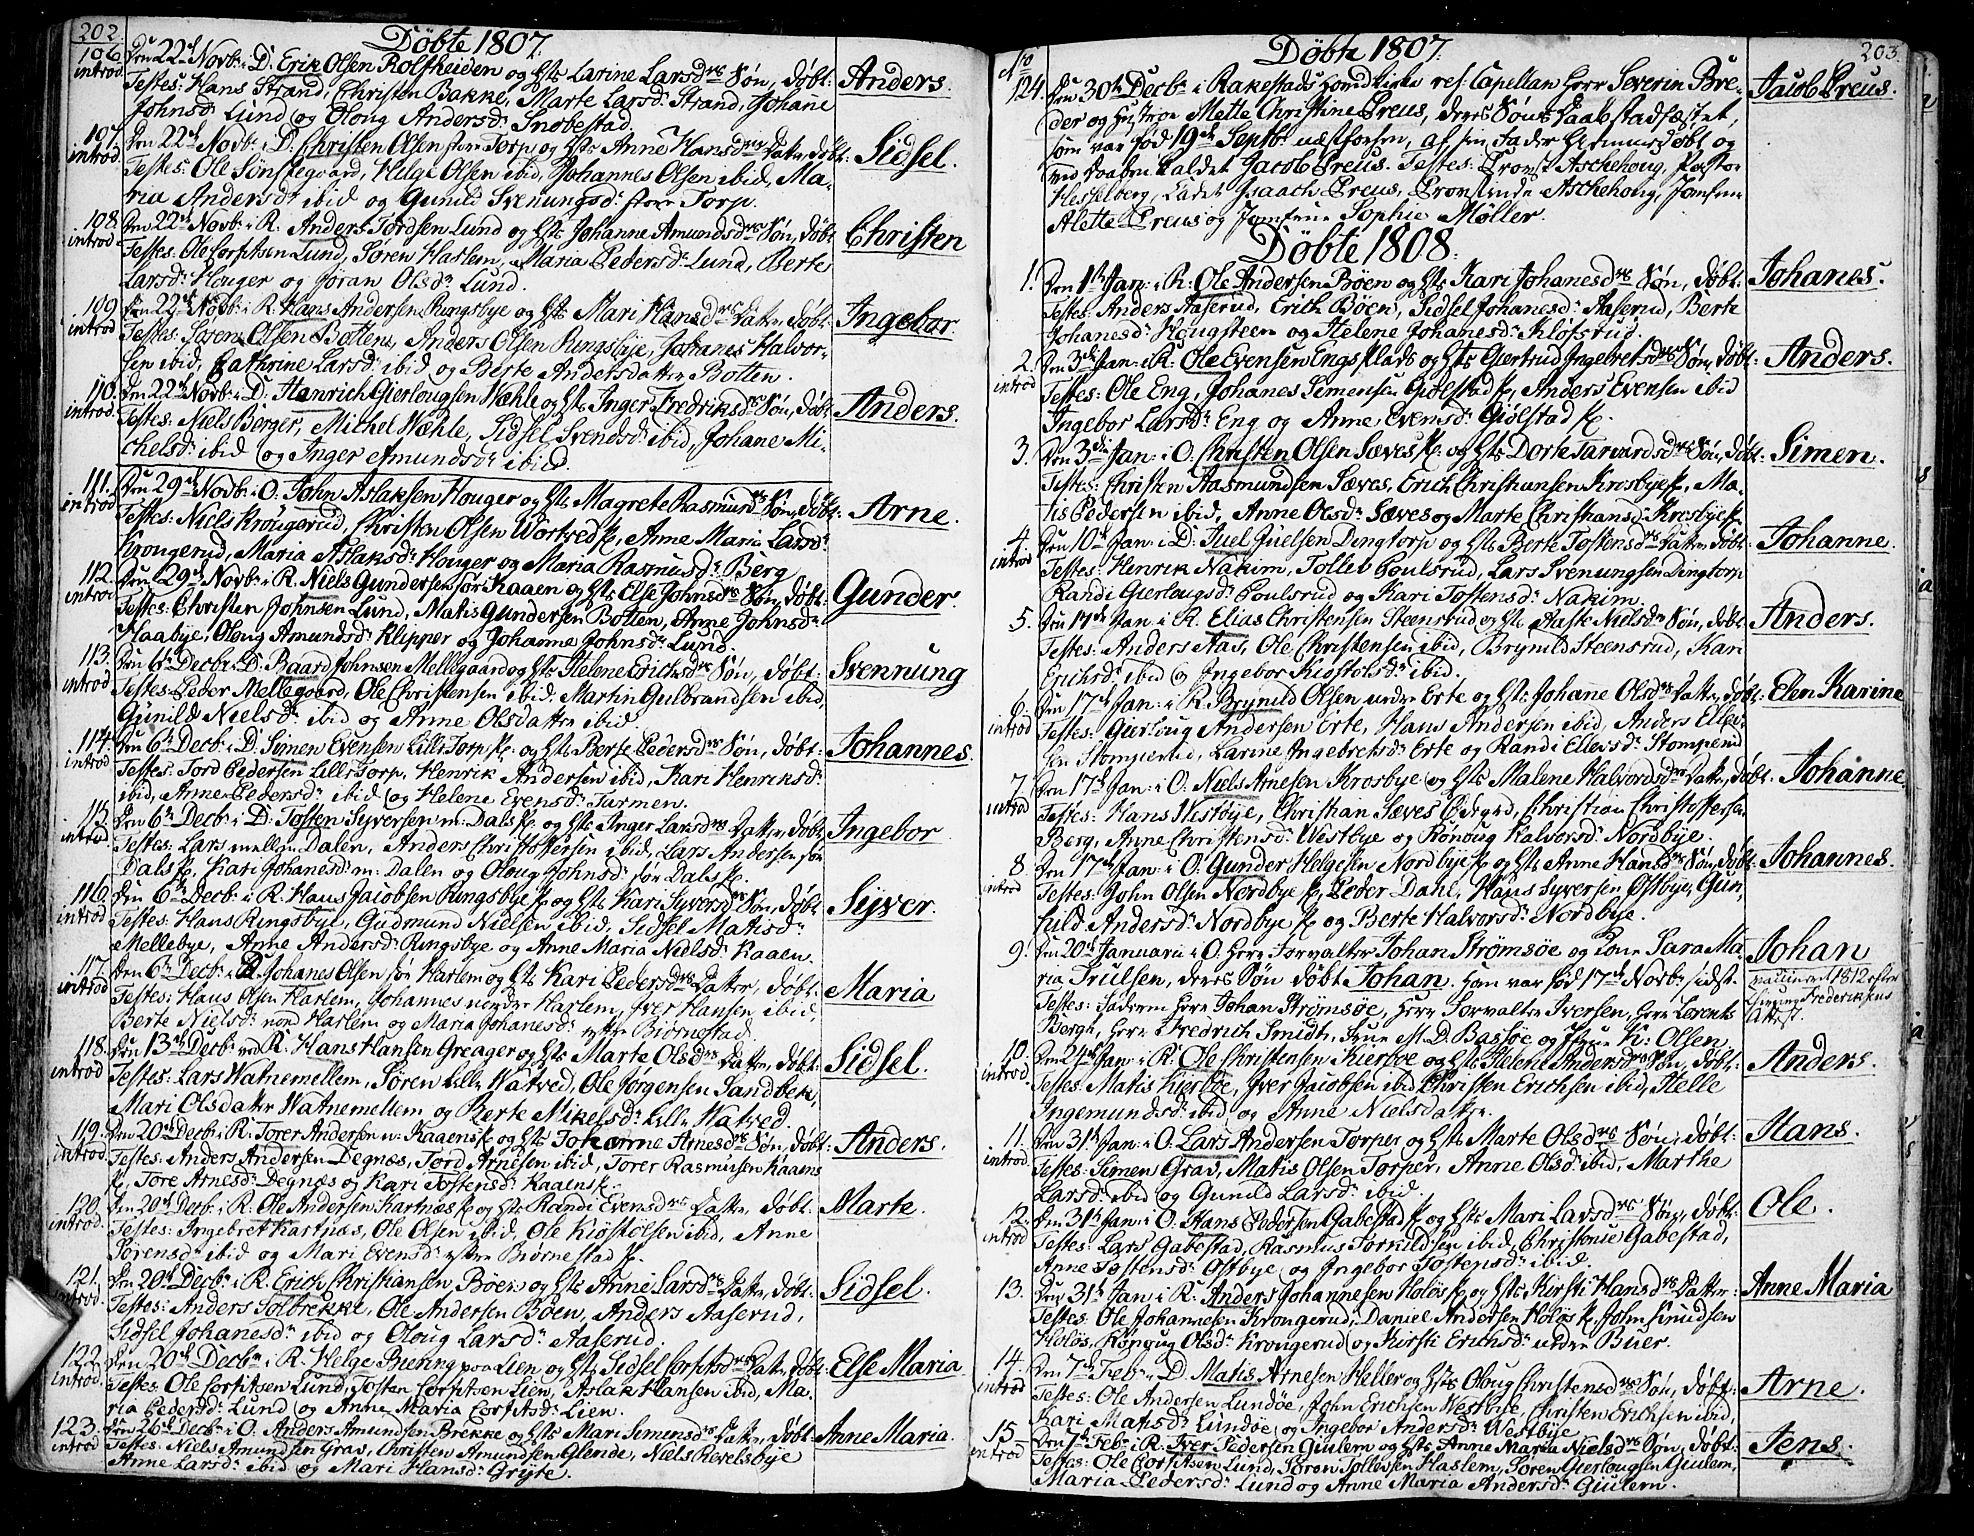 SAO, Rakkestad prestekontor Kirkebøker, F/Fa/L0005: Parish register (official) no. I 5, 1784-1814, p. 202-203